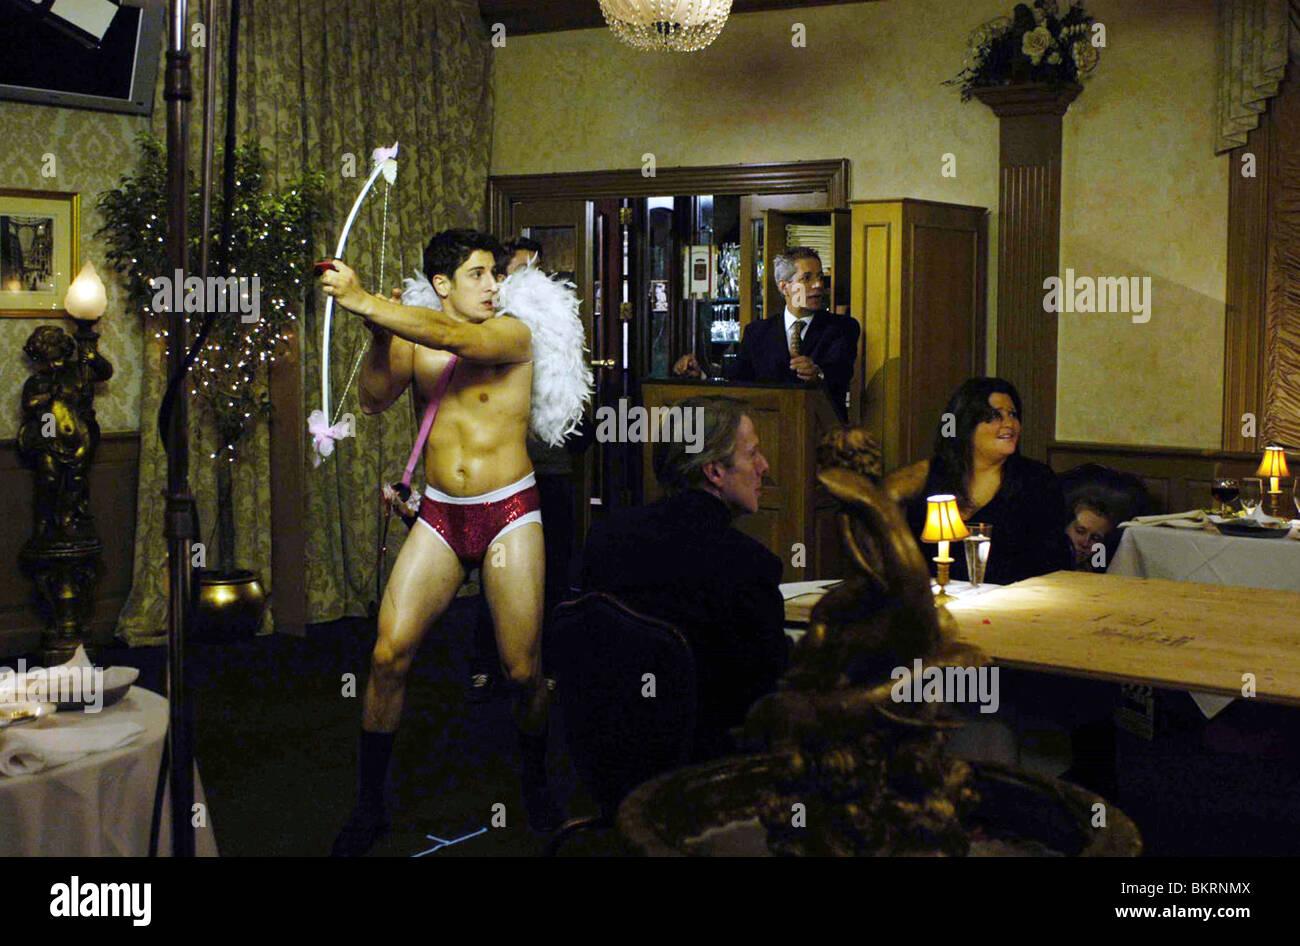 WEDDING DAZE (2004) GEORG STANFORD BROWN (DIR) WEDA 004 - Stock Image